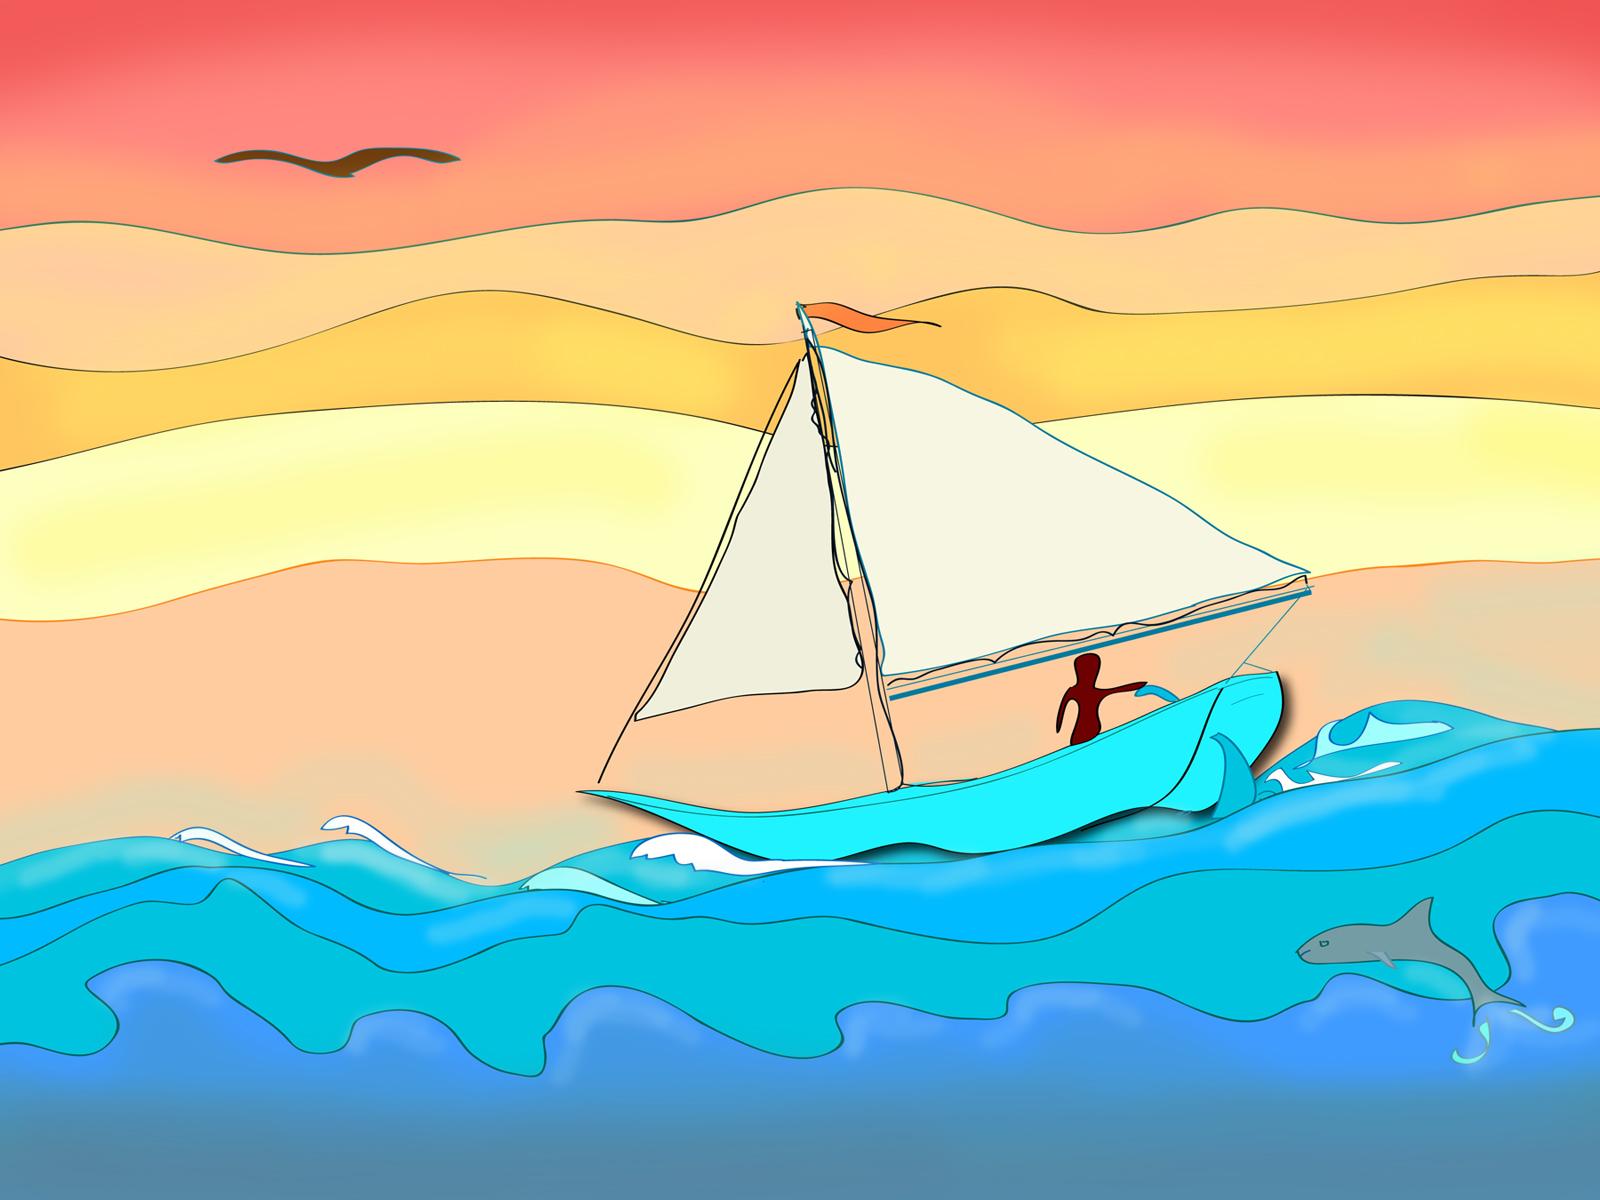 Animated Moving Boat Sail Boat Animation Penguin Moving Animation